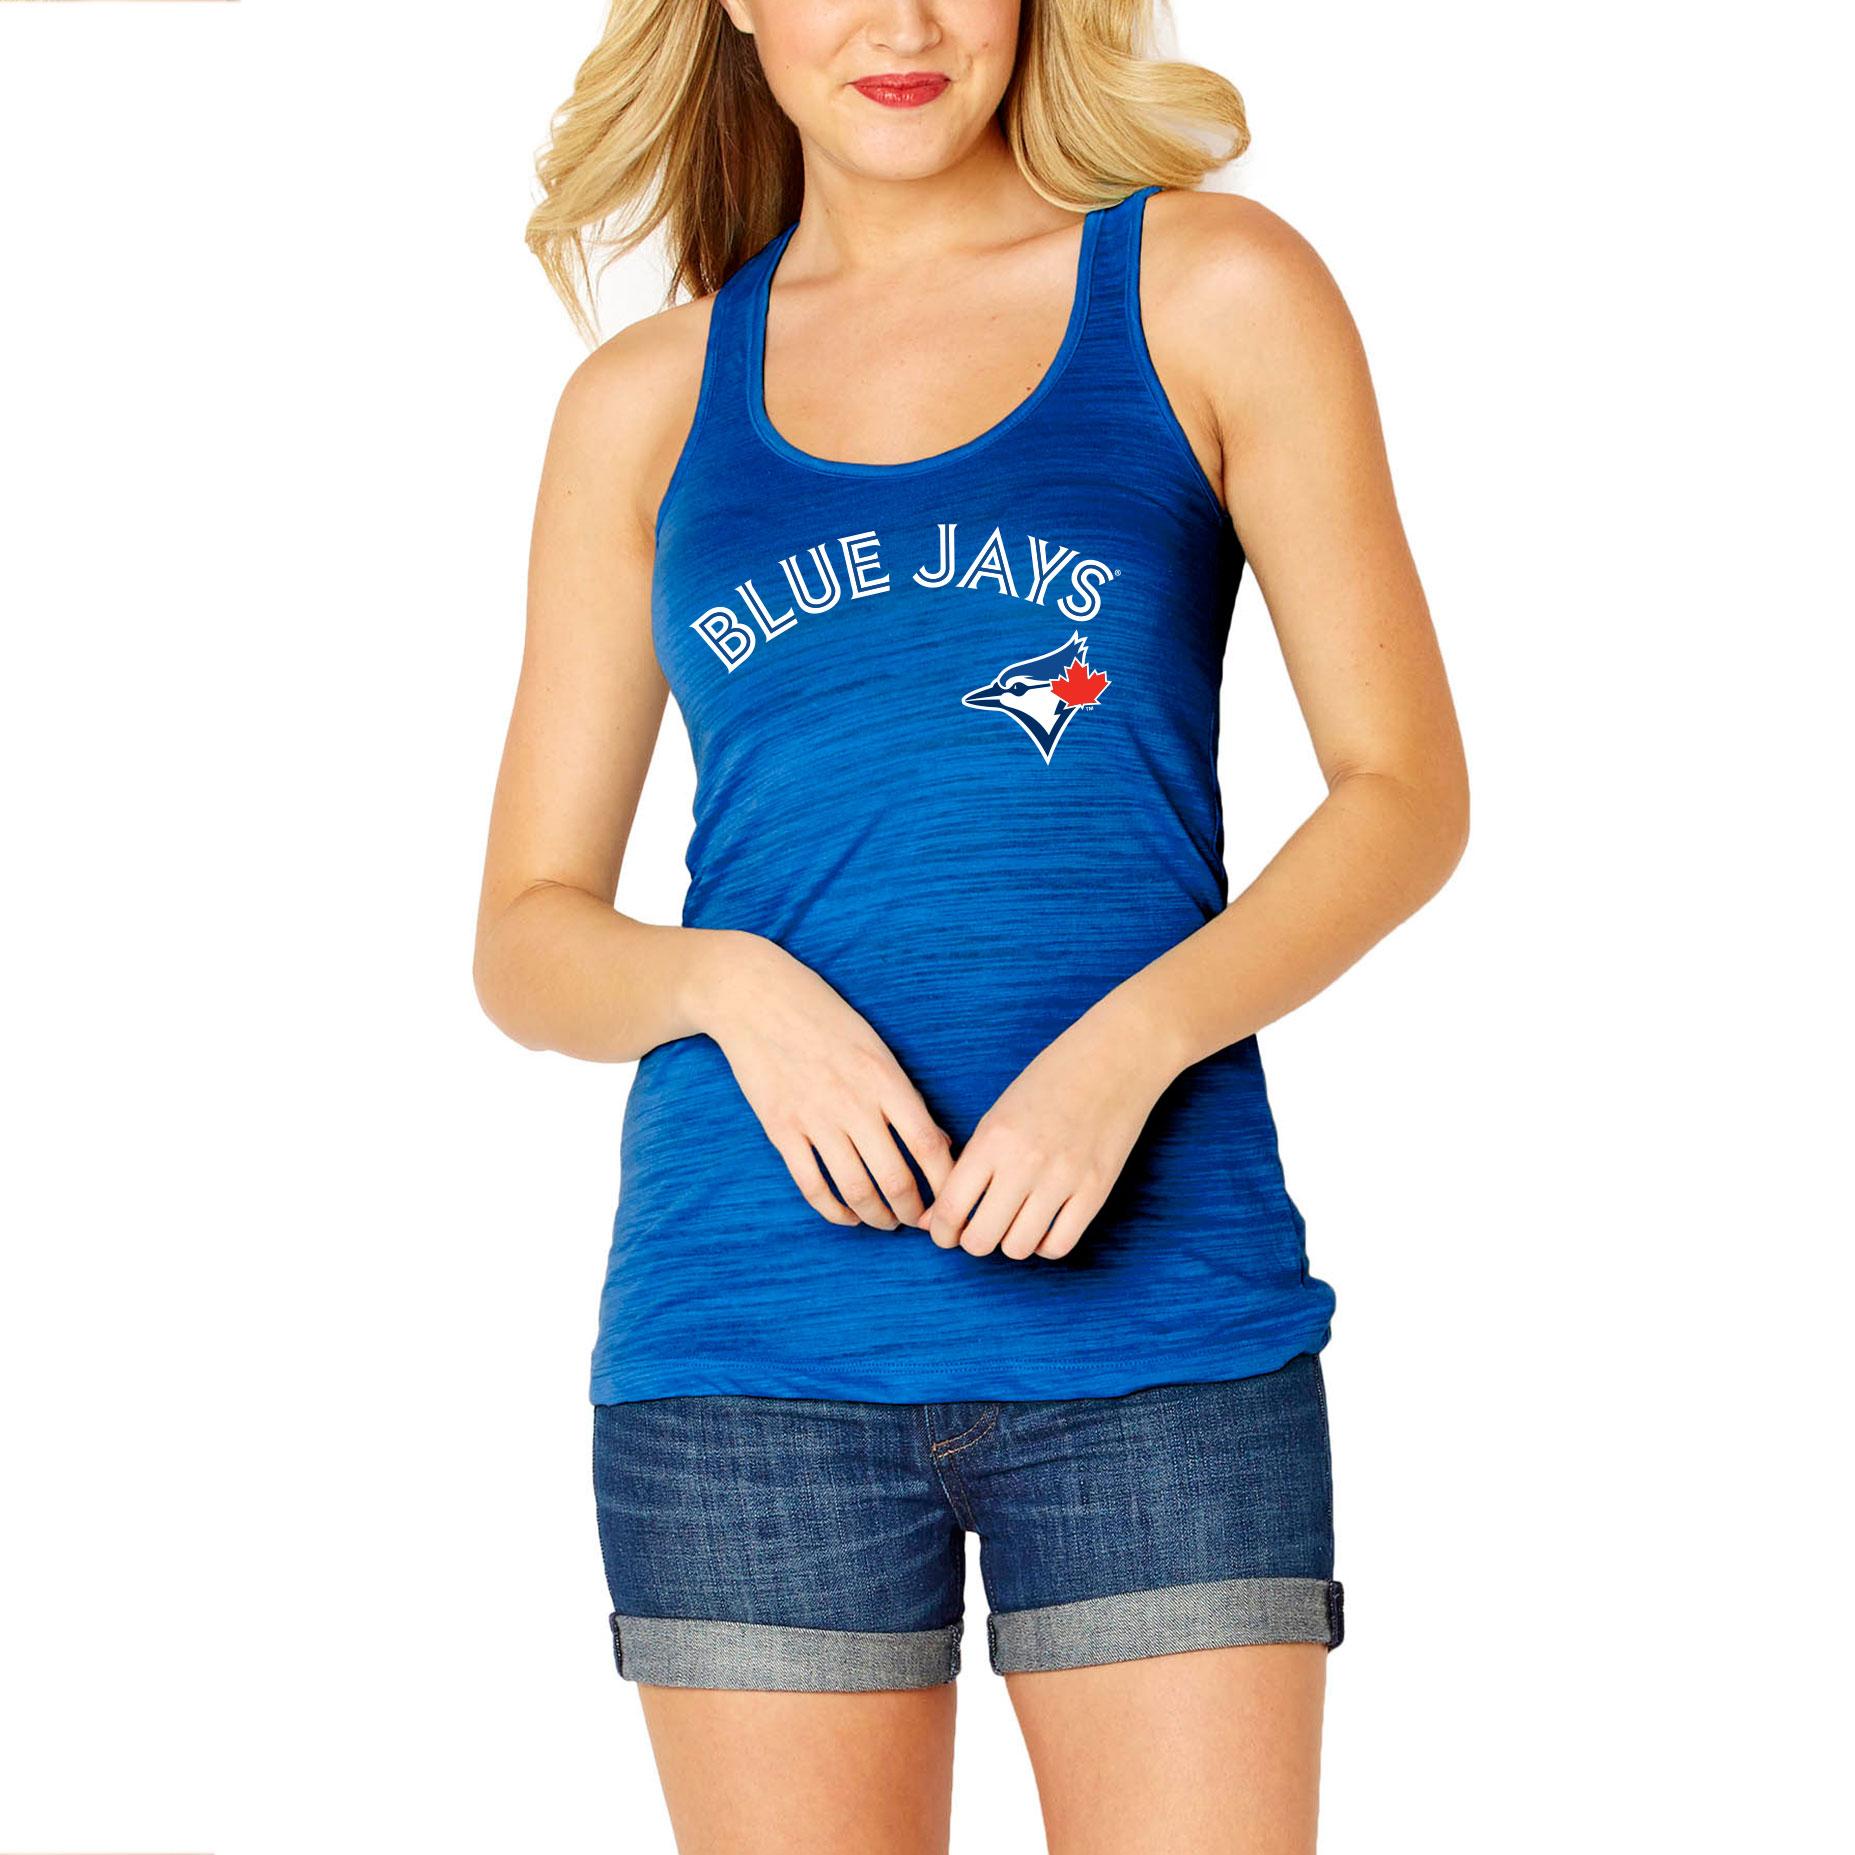 Toronto Blue Jays Soft As A Grape Women's Front & Back Tri-Blend Racerback Tank Top - Royal